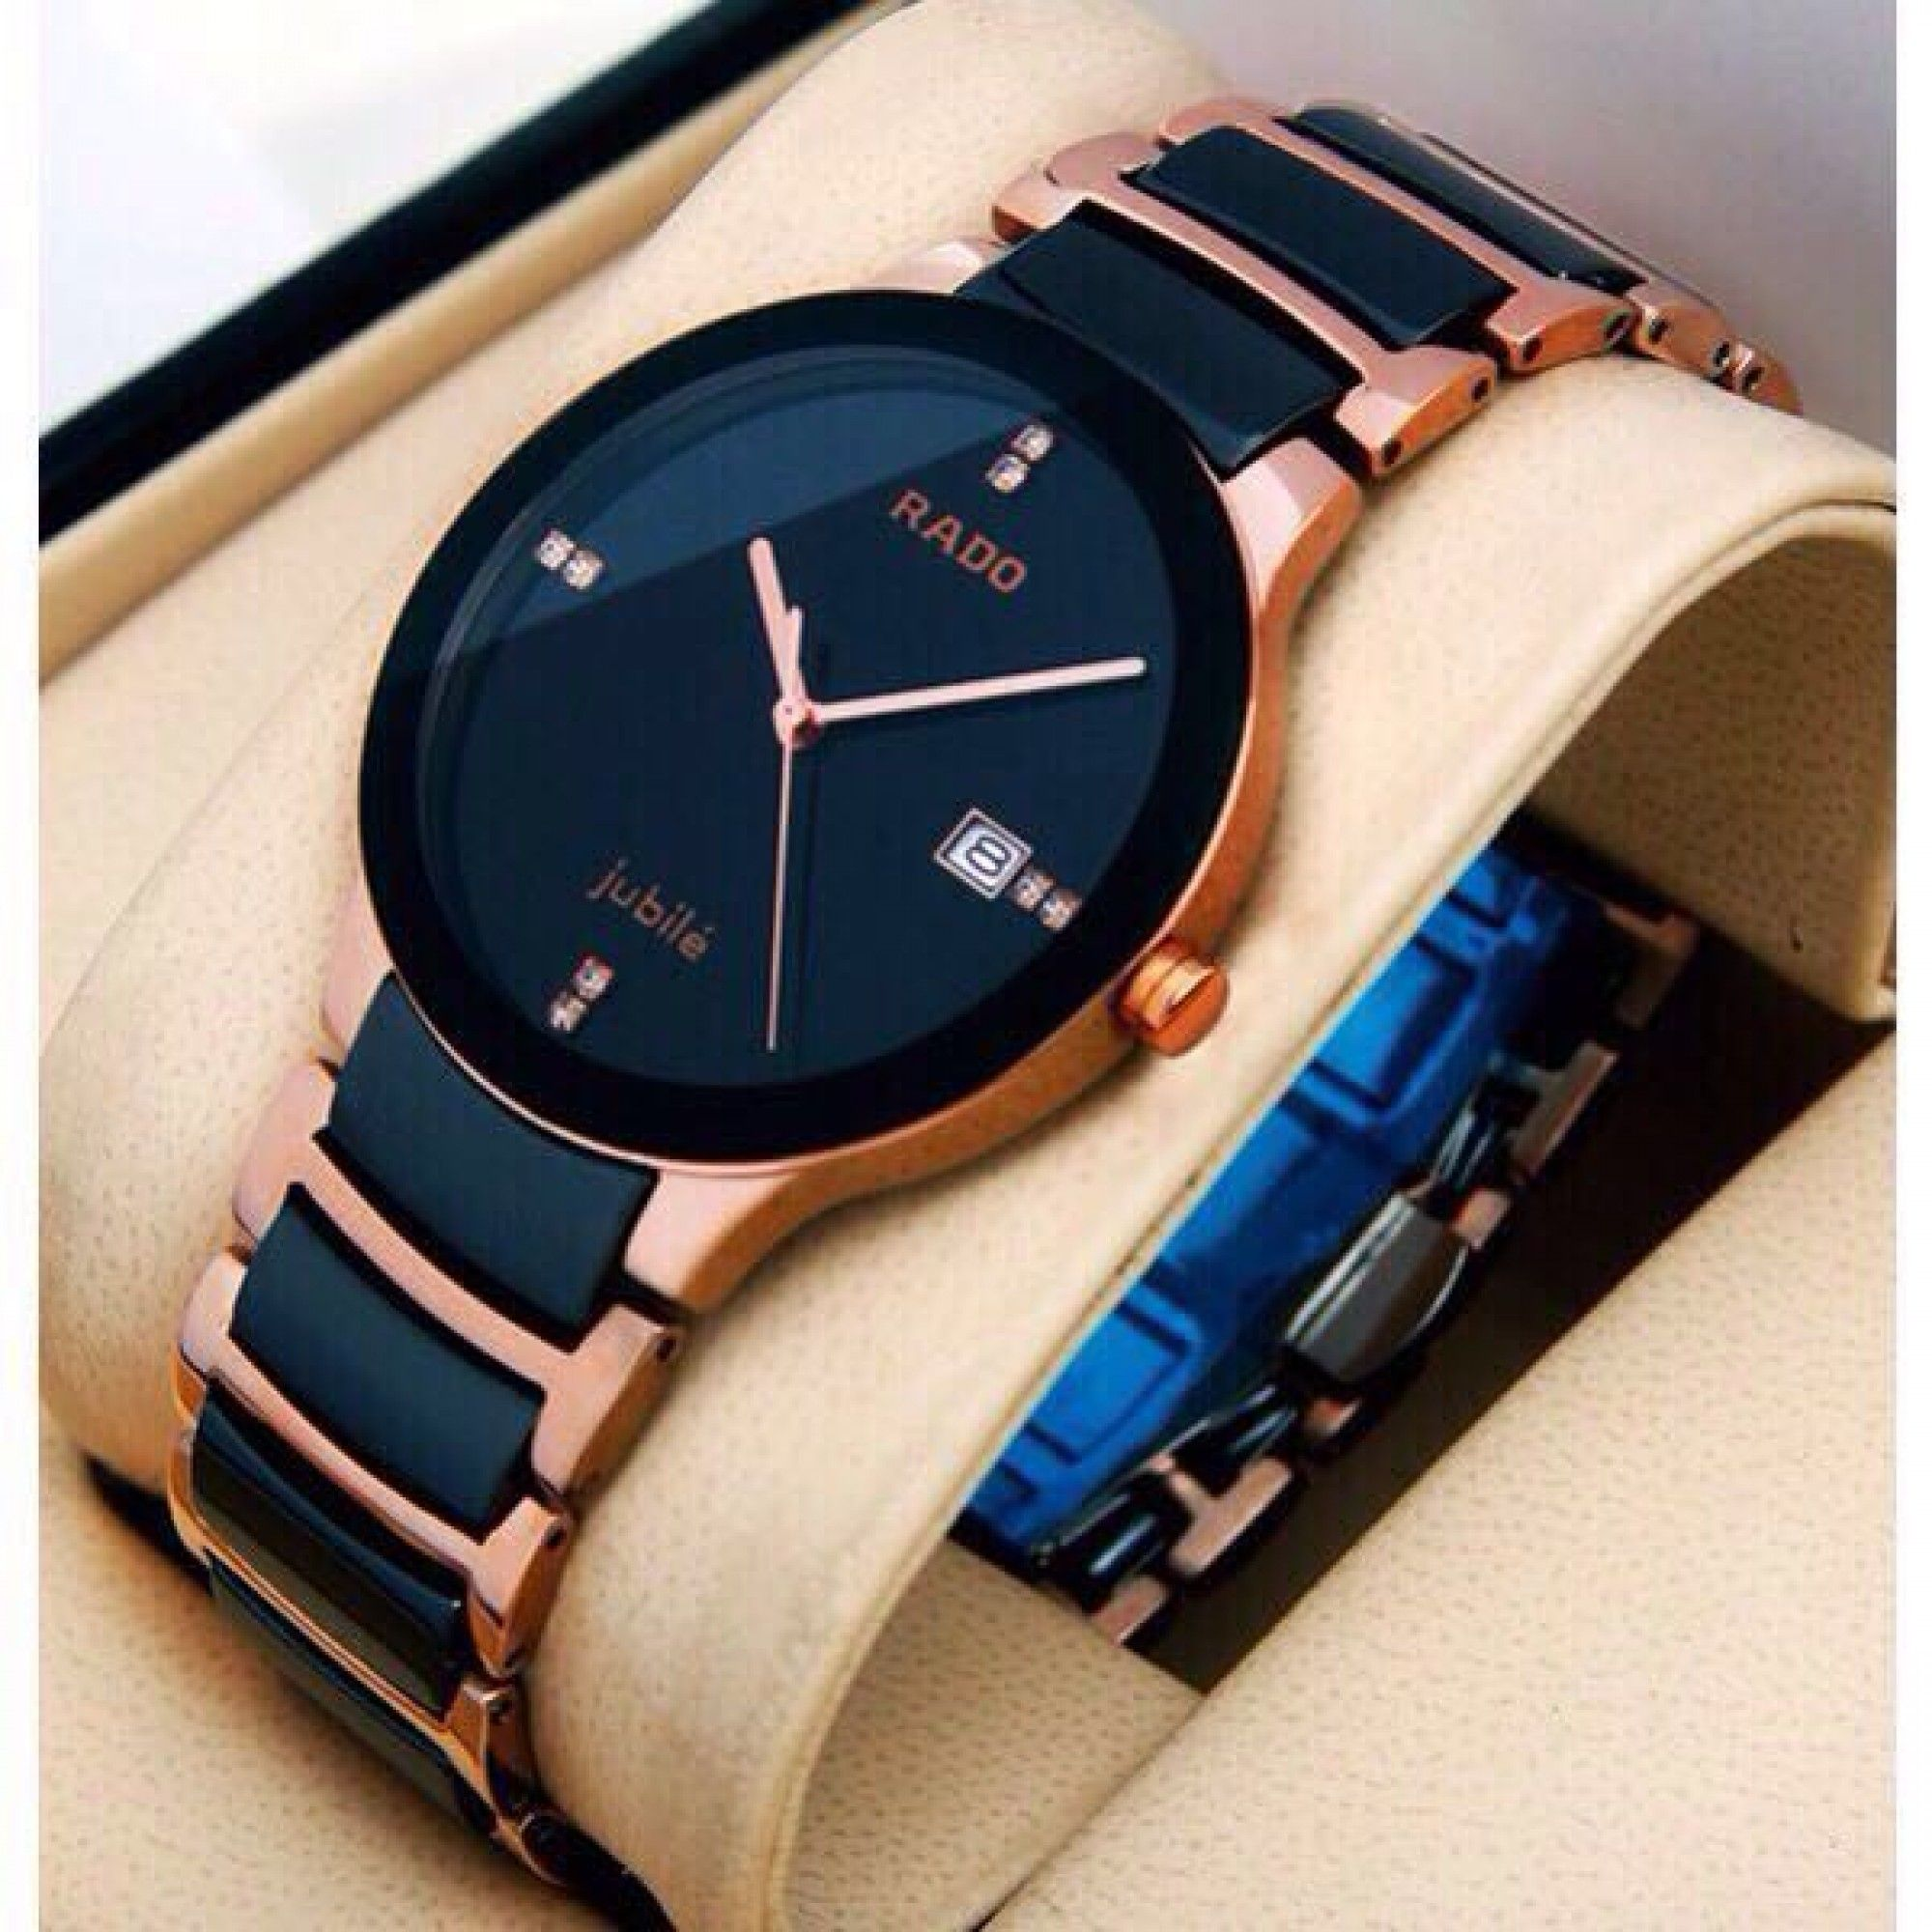 Rado Centrix Black Dial Women's Watch rose gold